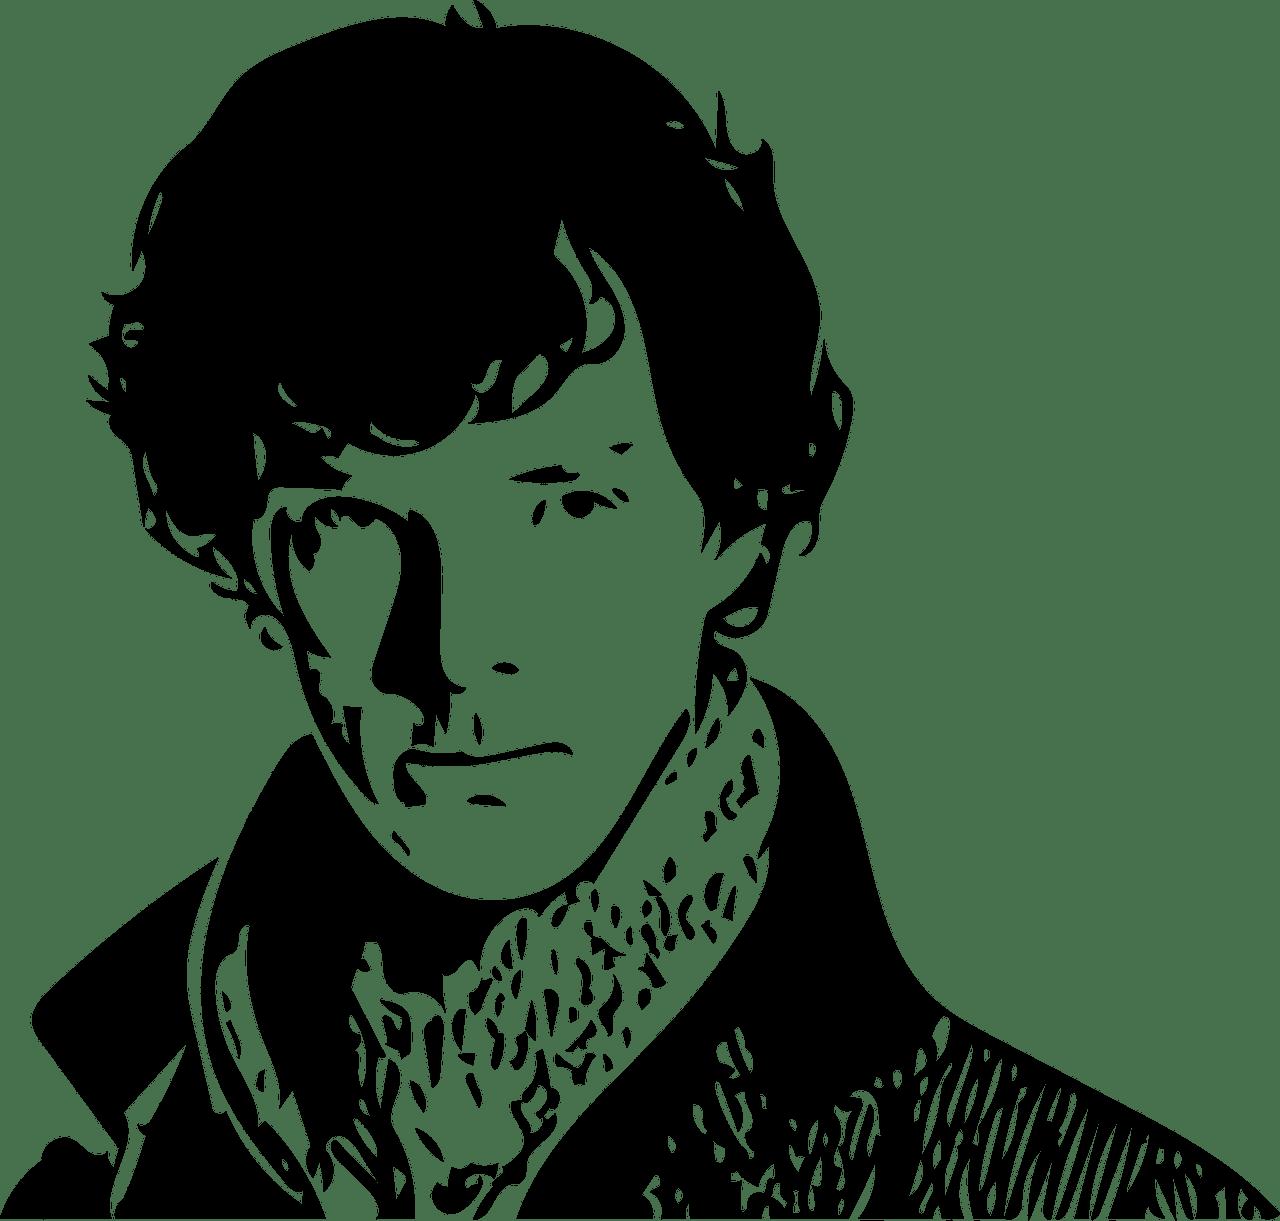 Sherlock Holmes outline - external conflict, internal vs. external conflict